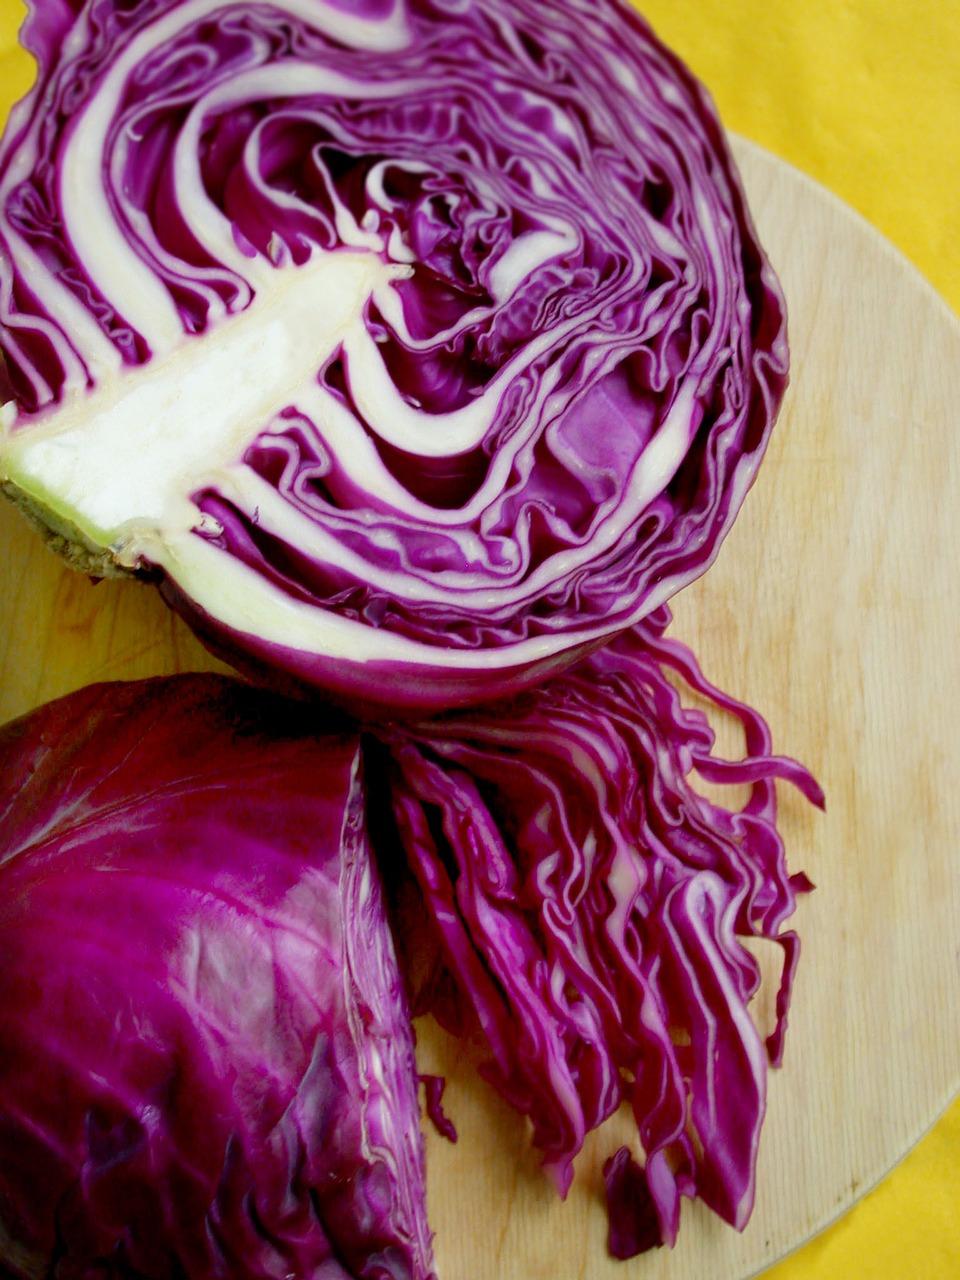 red-cabbage-2159547_1280.jpg